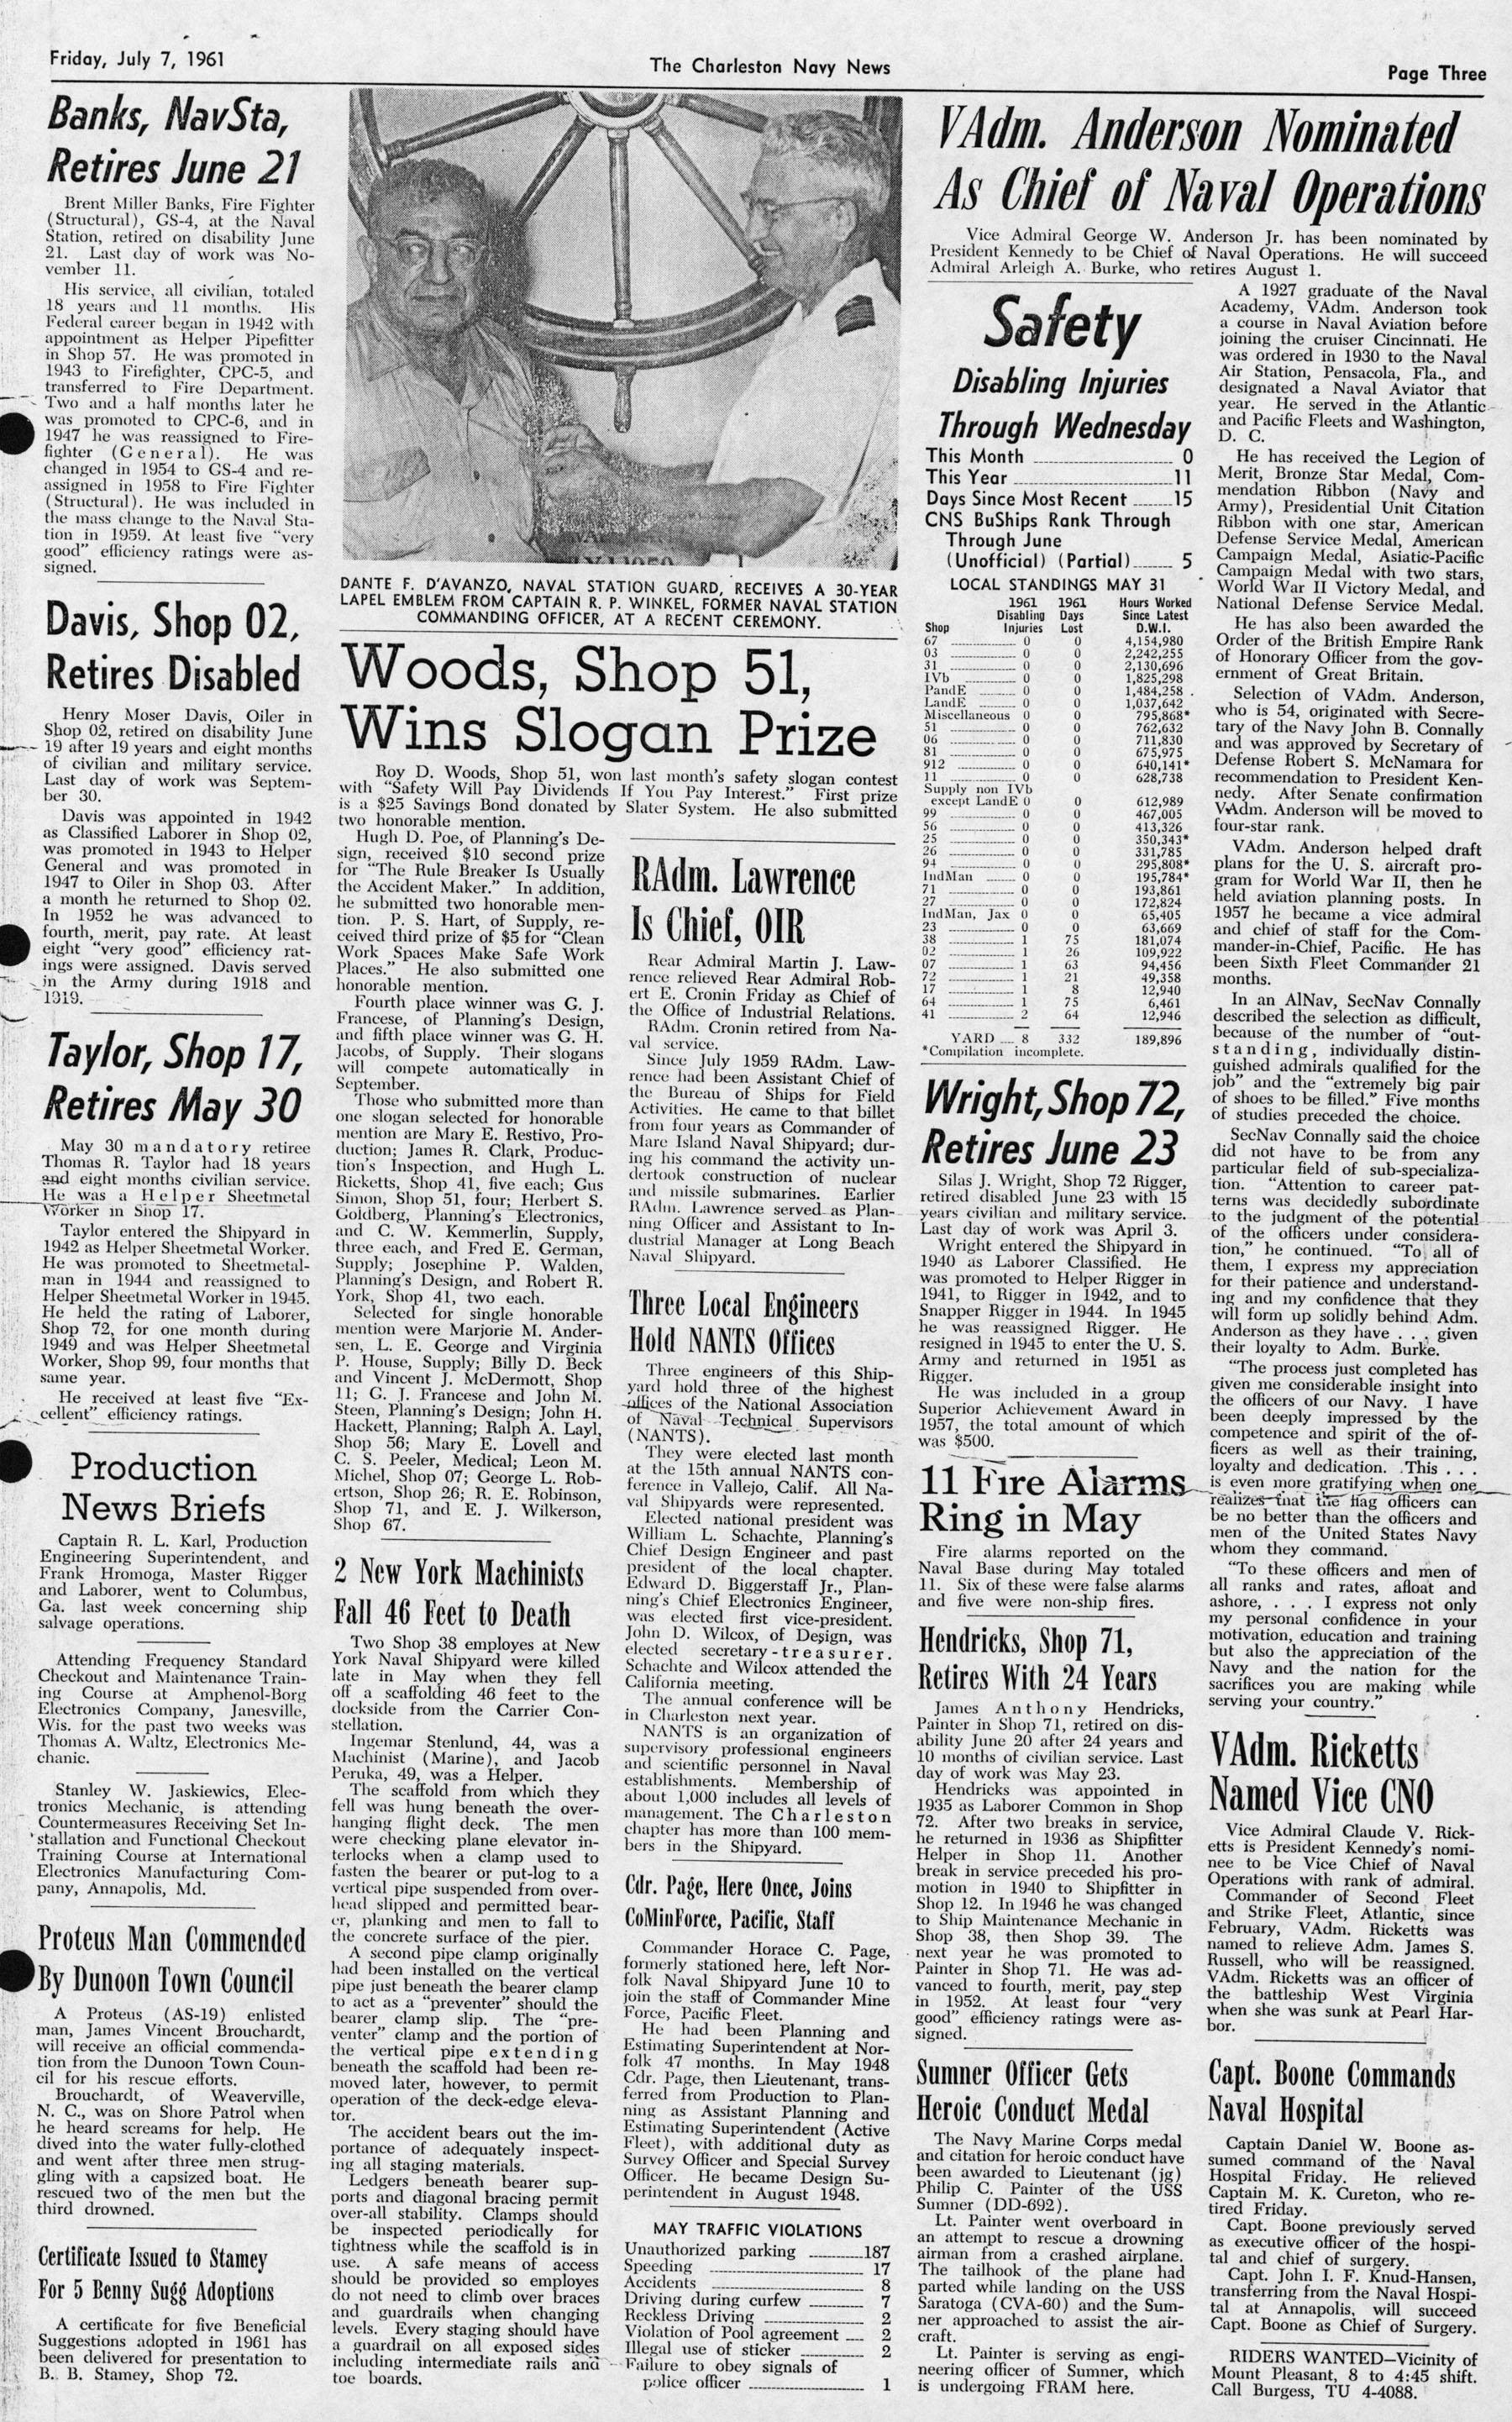 The Charleston Navy News, Volume 20, Edition 1, page iii